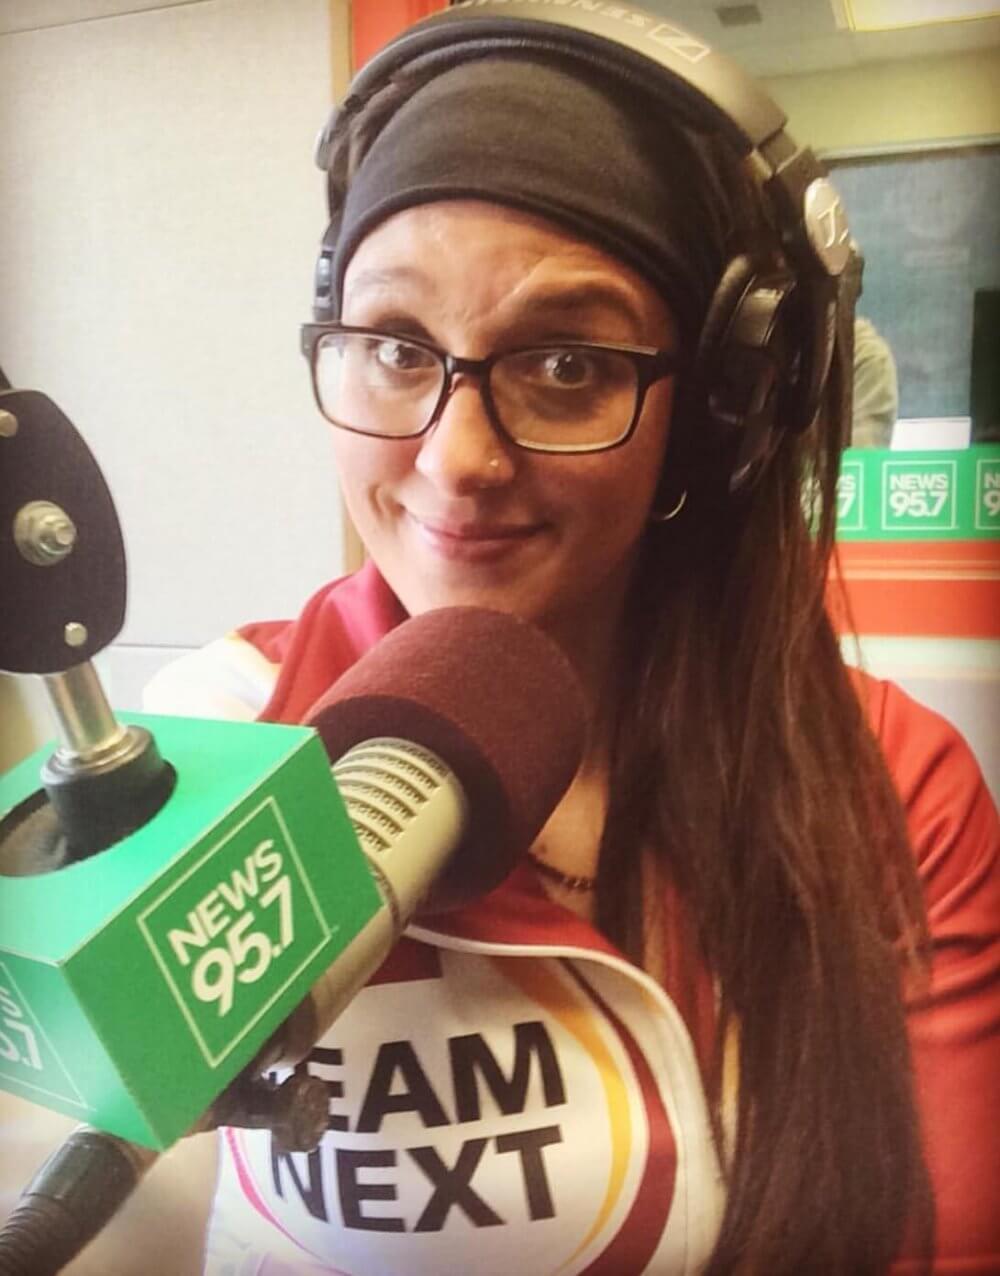 Pam radio interview